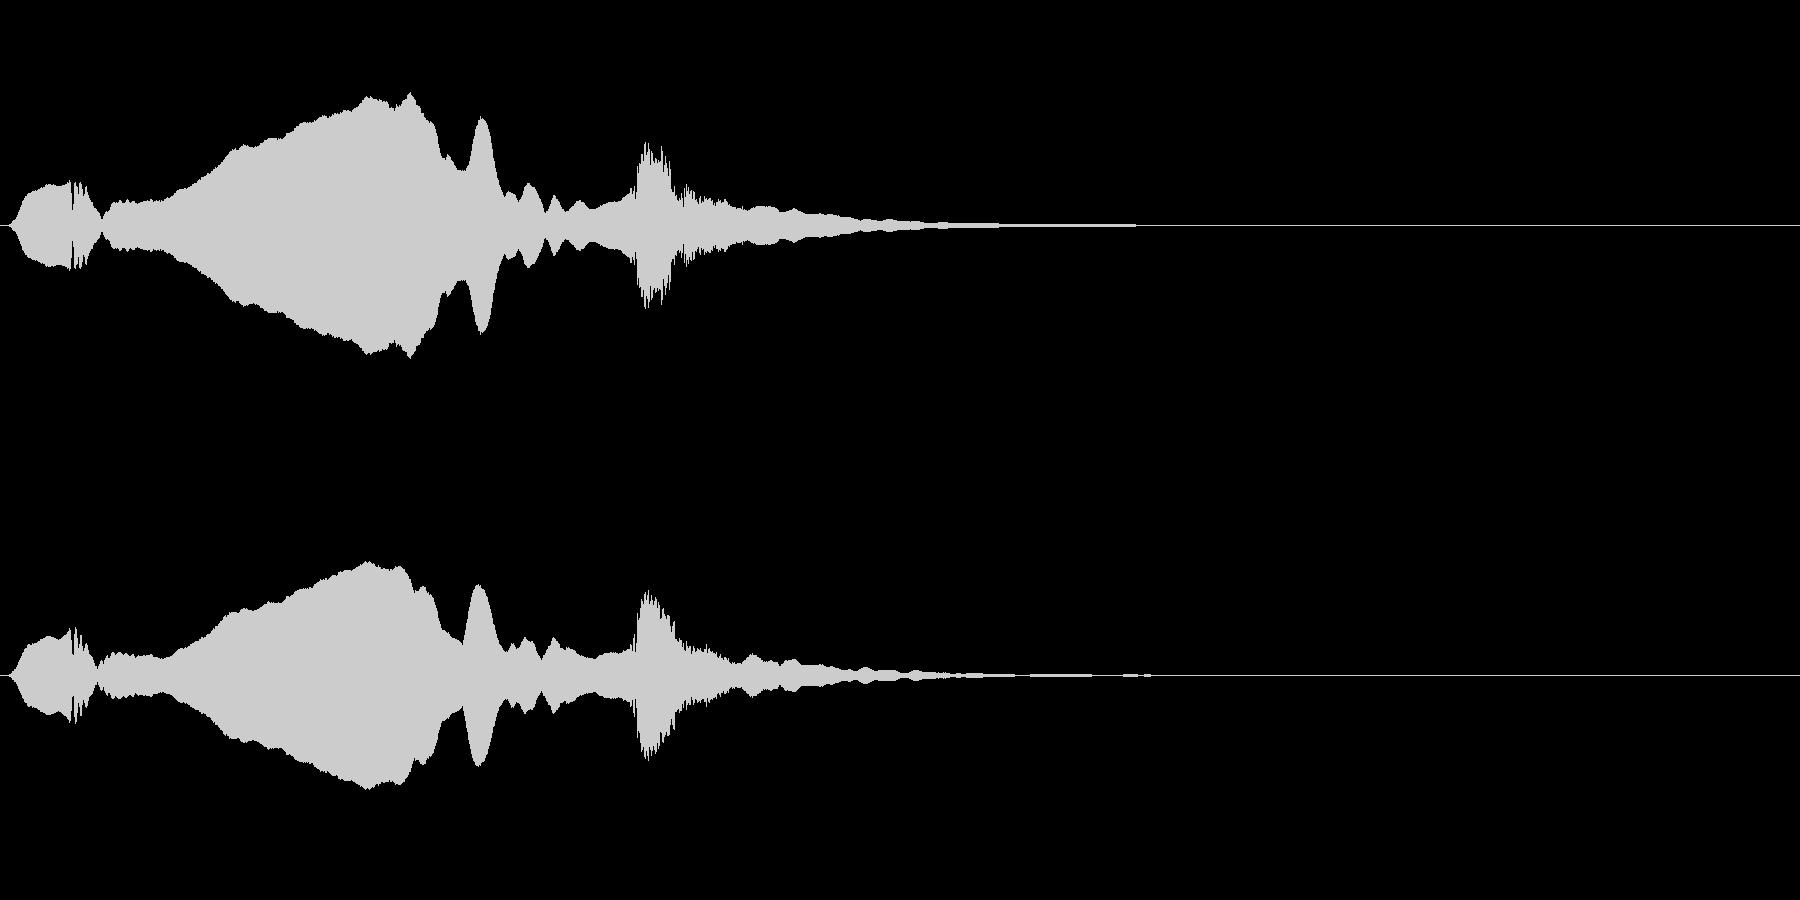 尺八 生演奏 古典風#4の未再生の波形